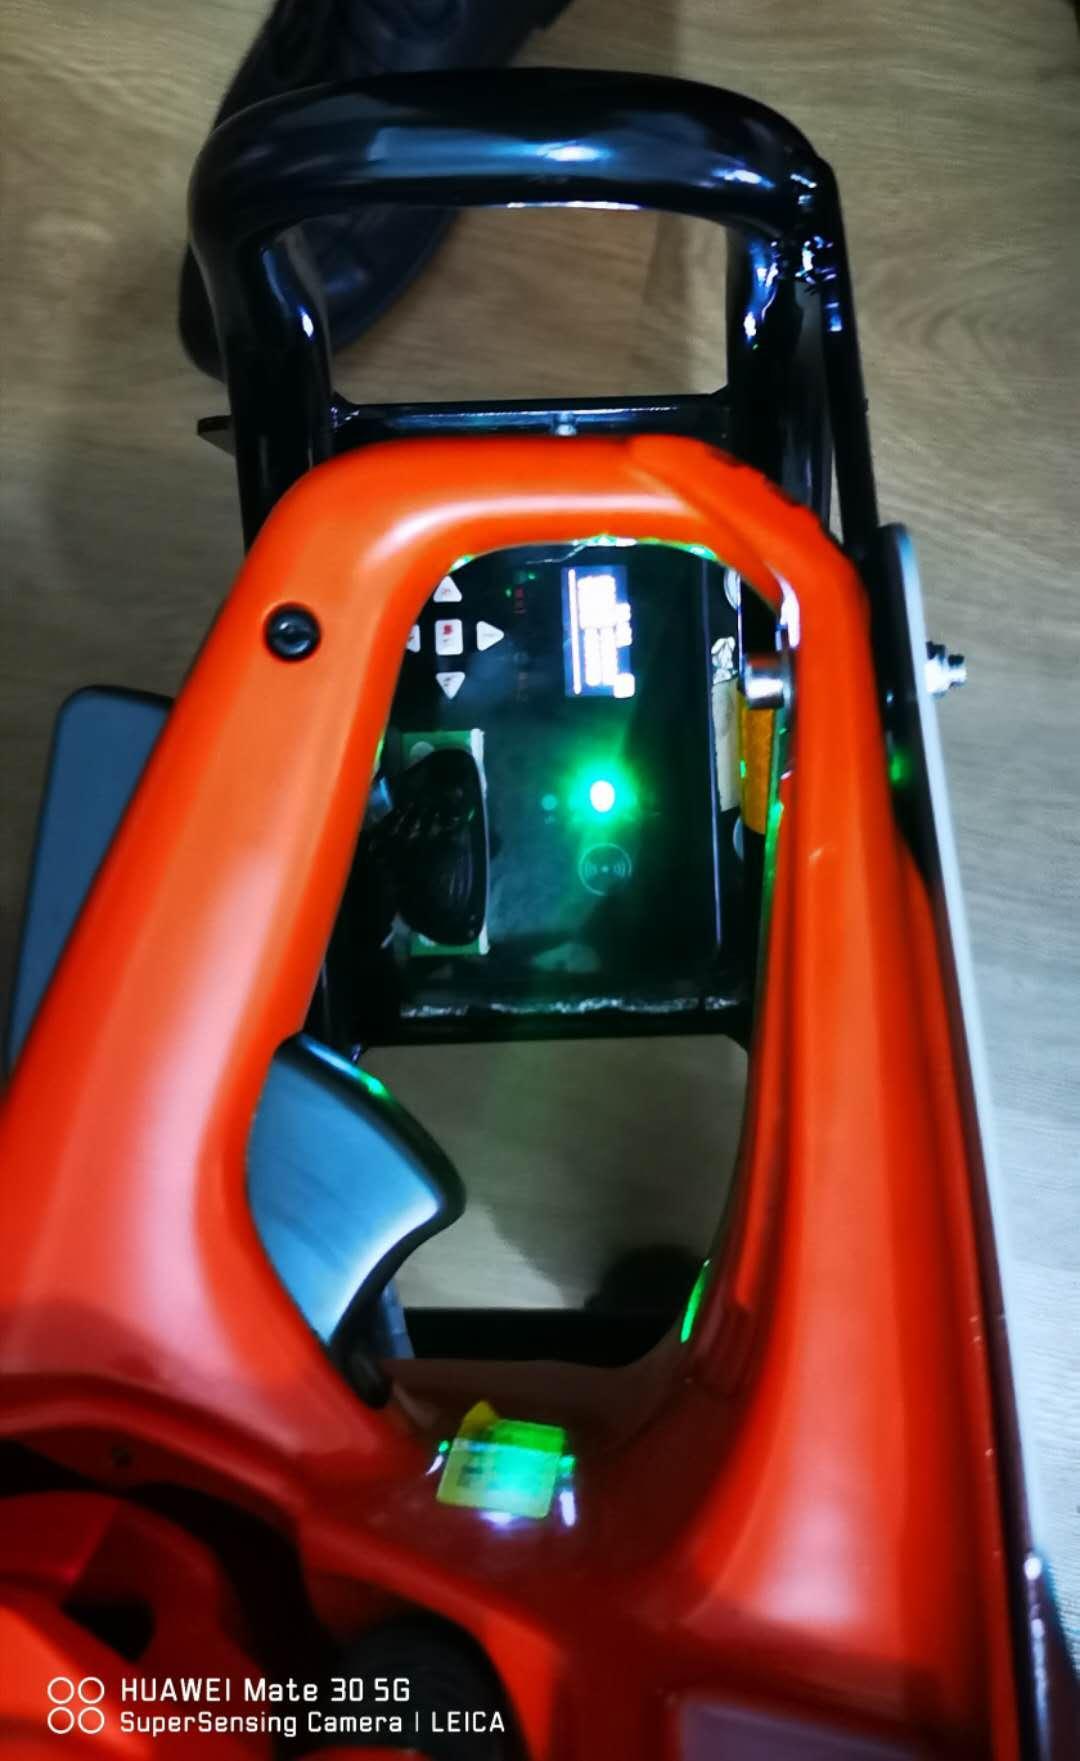 Railway maintenance Torque adjustable internal combustion bolt wrench NLB-1200 5